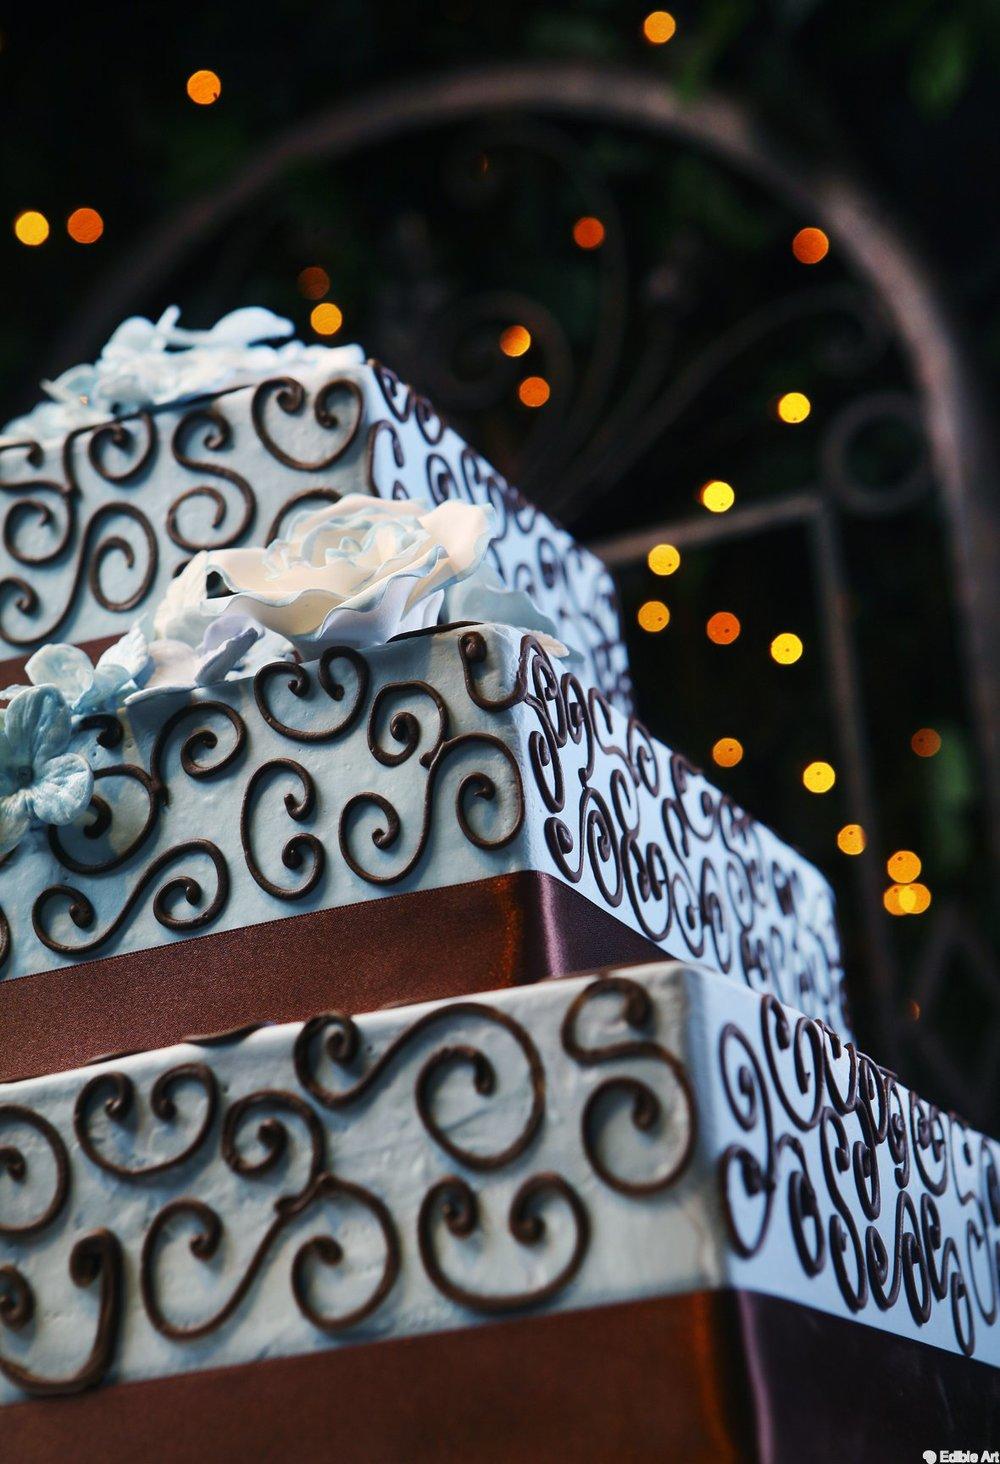 Edible blue_brown by AzulPhotography for SBG.jpg